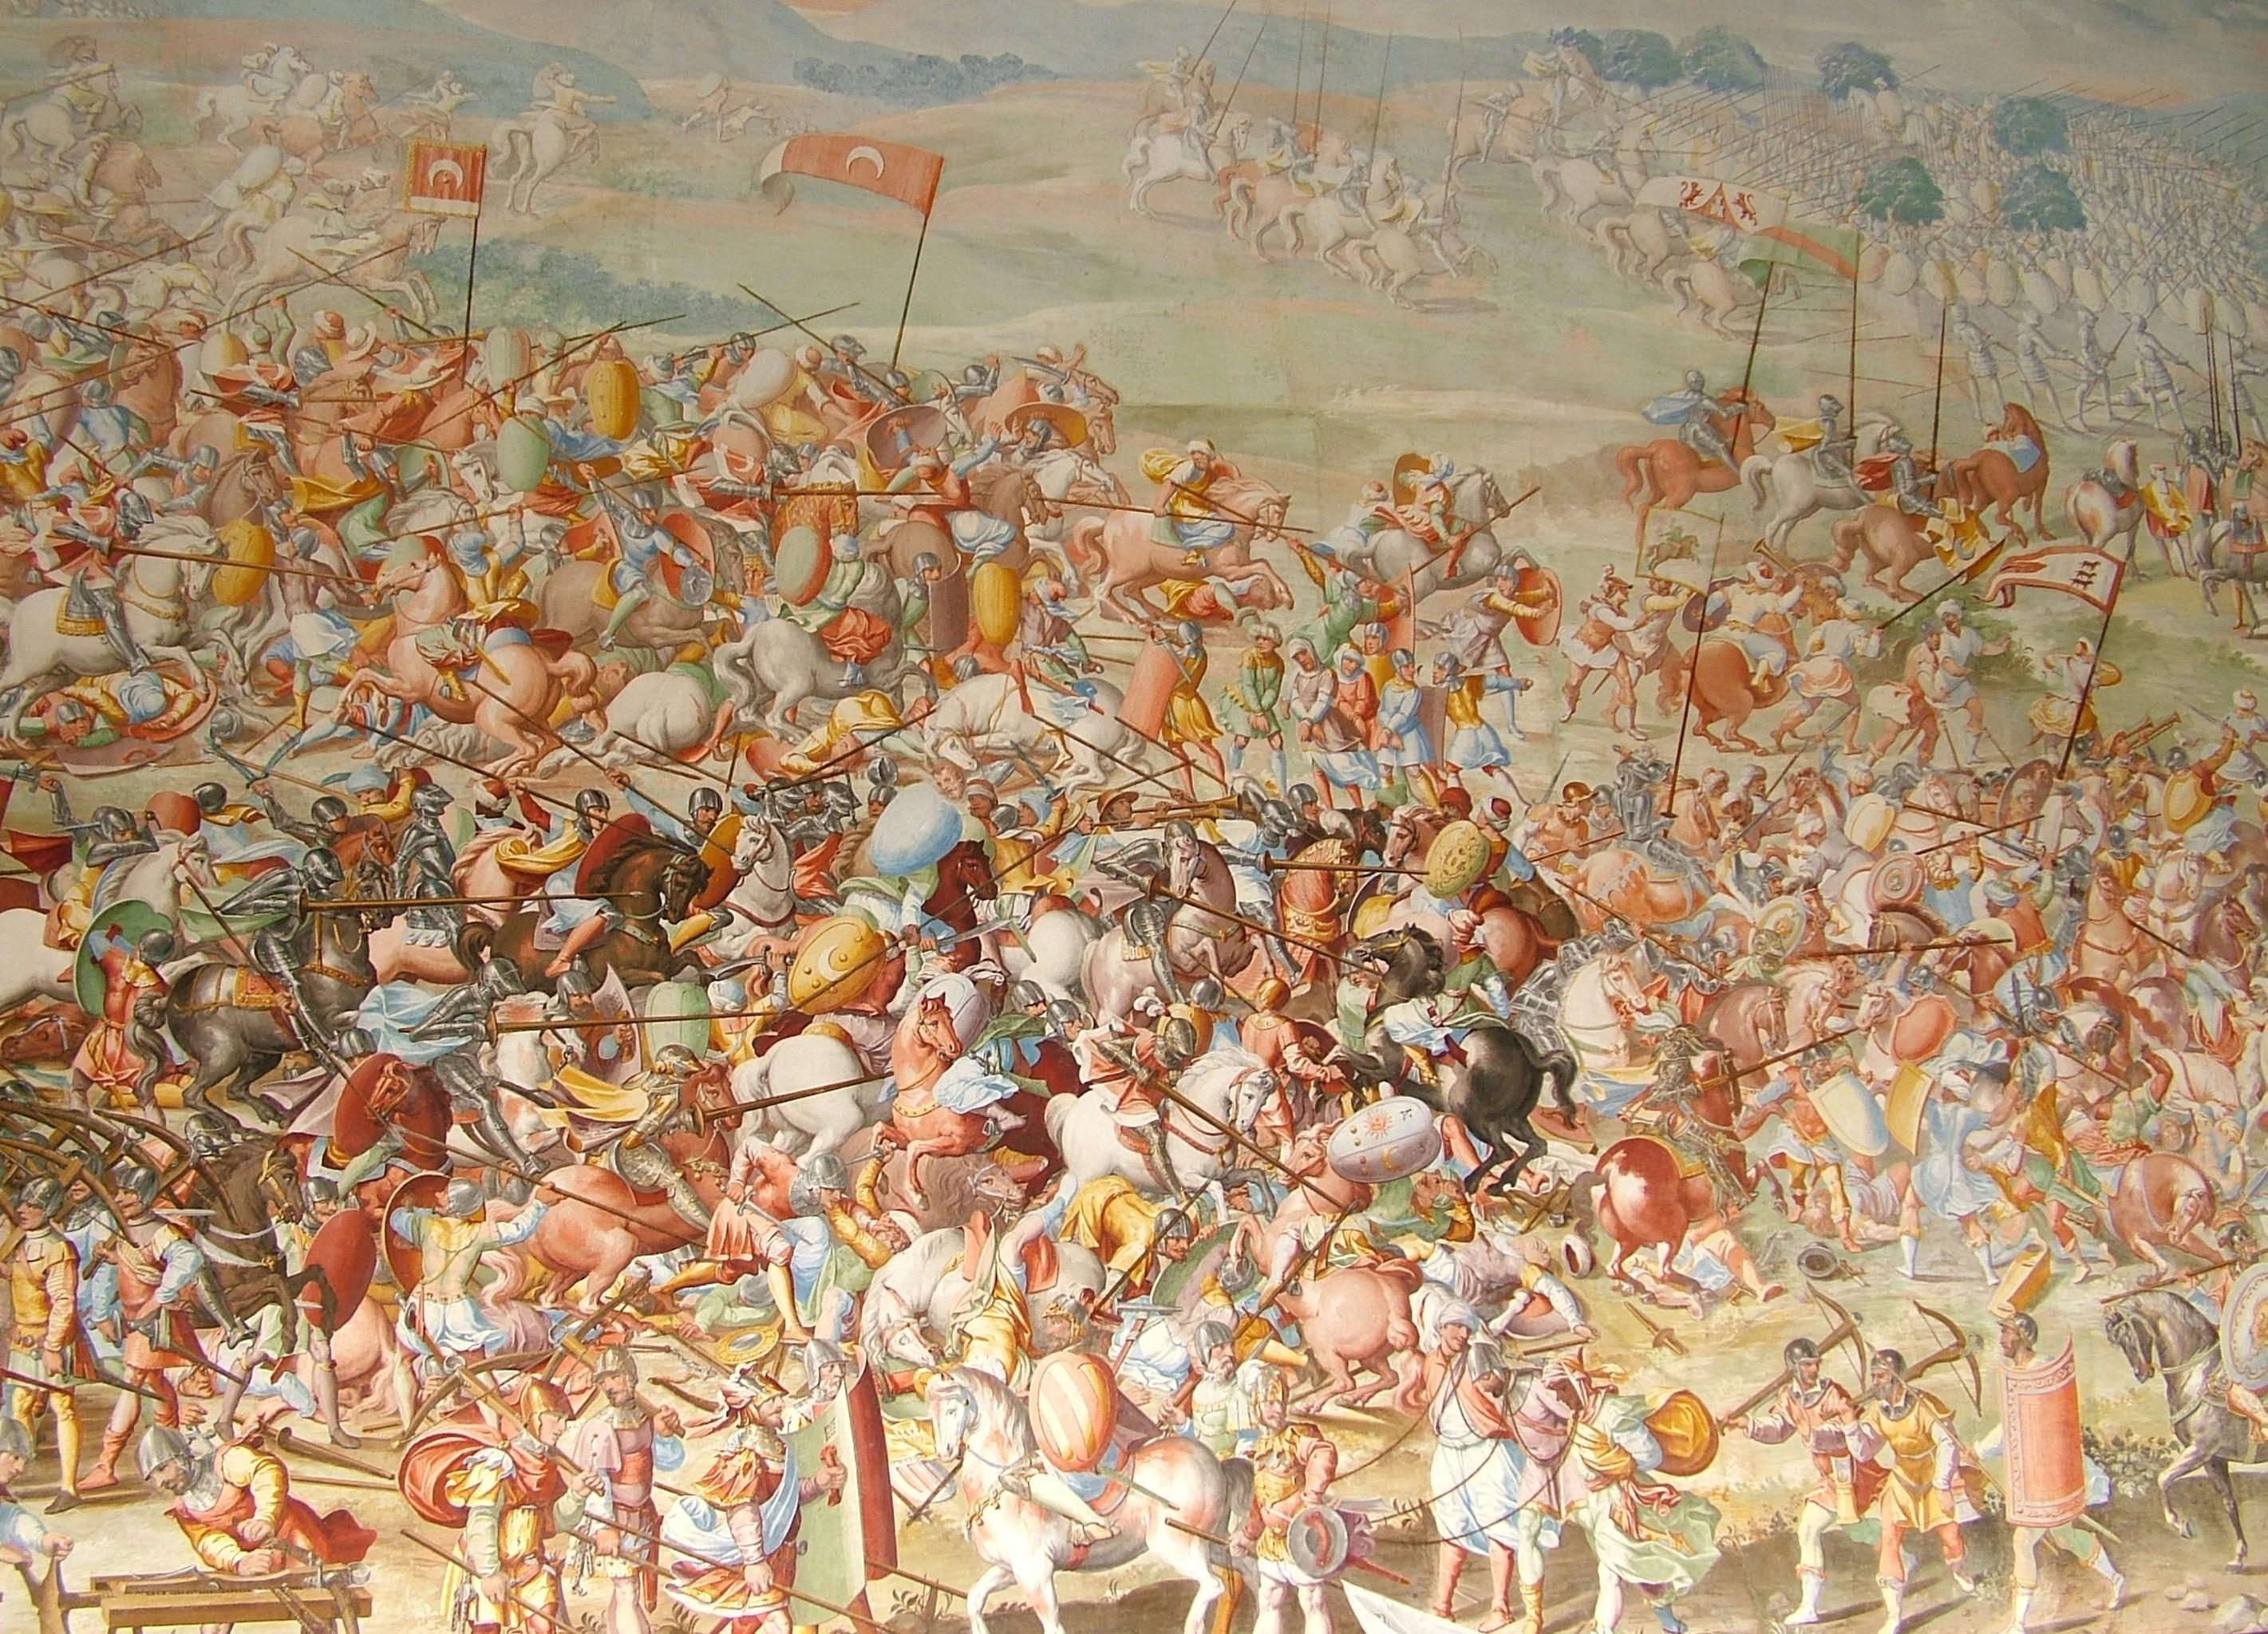 https://i1.wp.com/upload.wikimedia.org/wikipedia/commons/b/bb/Battle_of_Higueruela.jpg